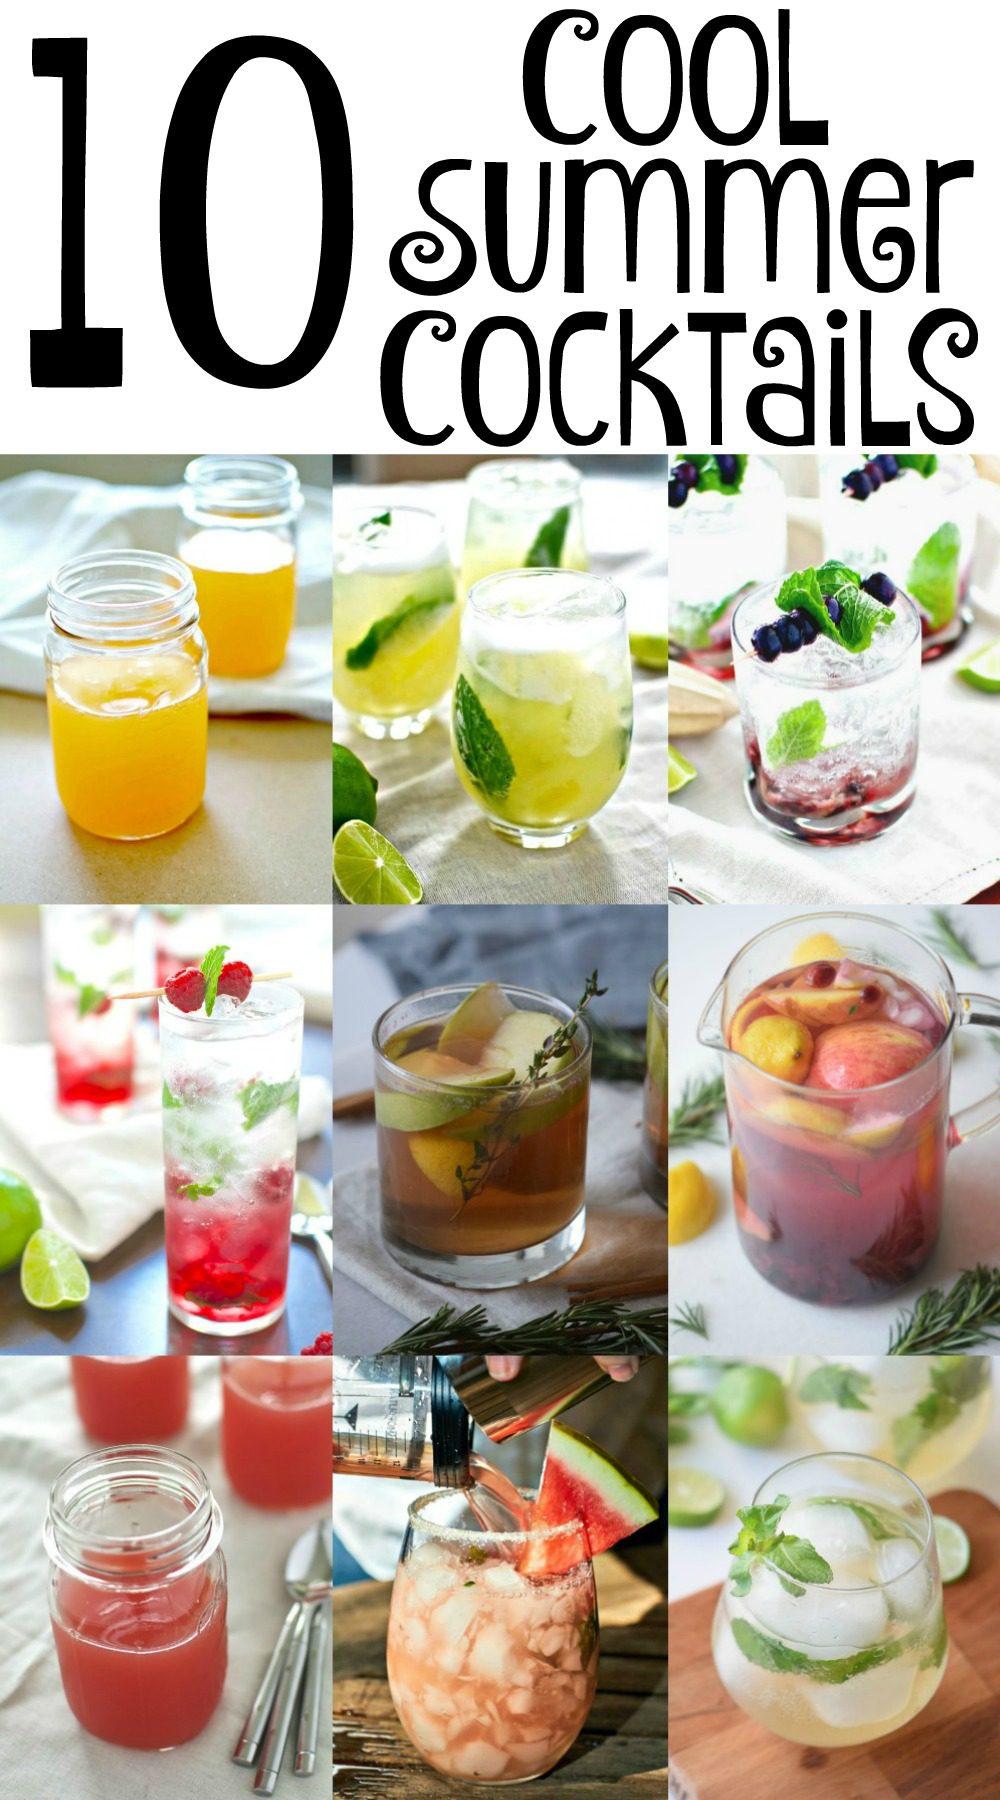 10 Cool Summer Cocktails